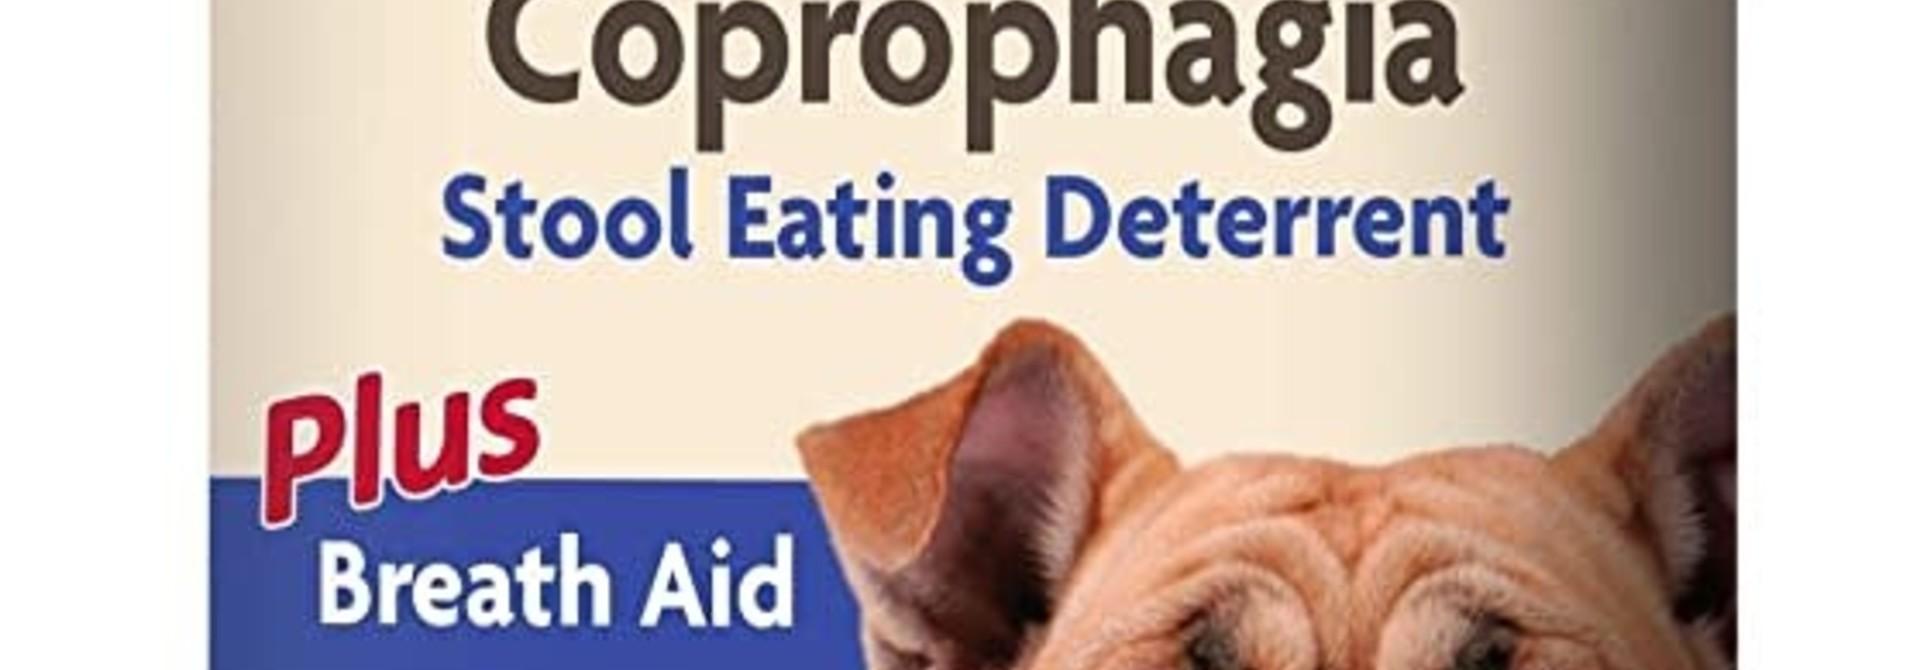 Coprophagia Stool Eating Deterrent Tabs 60PK